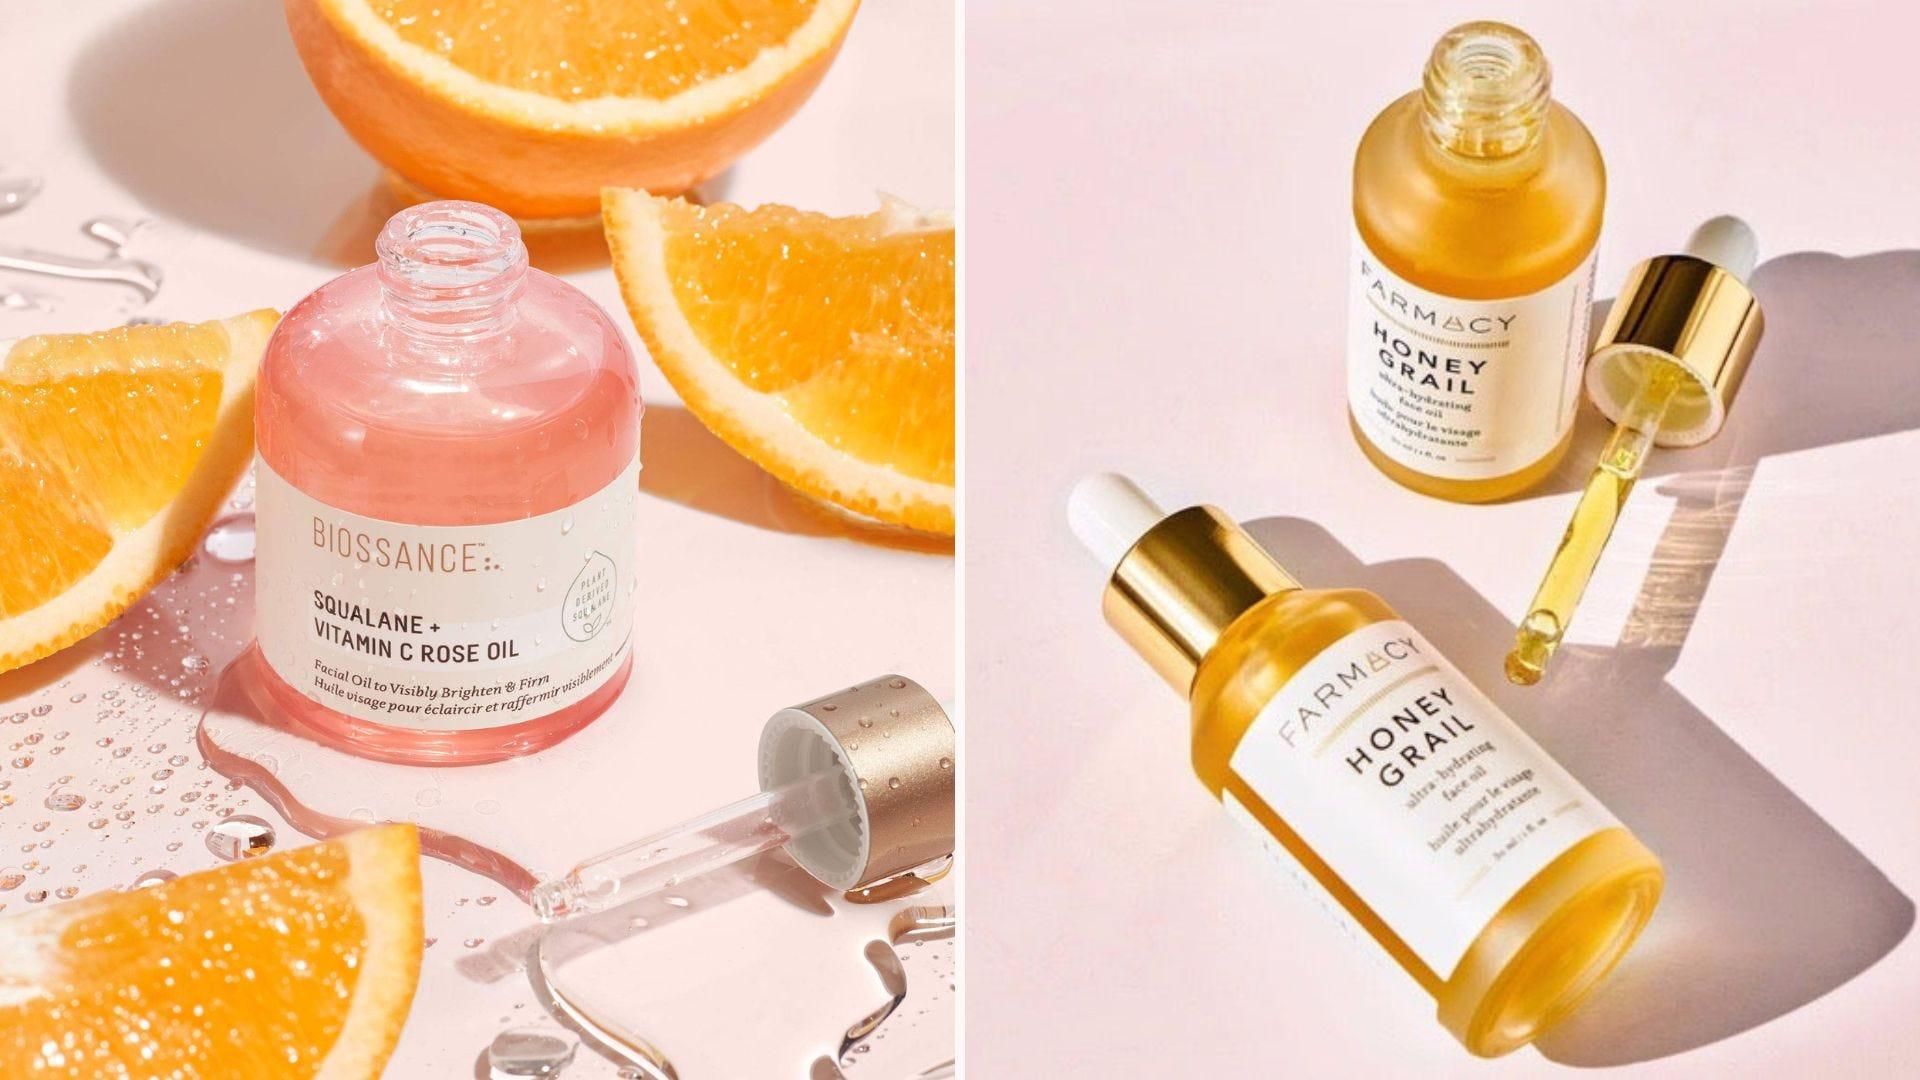 Biossance Squalane + Vitamin C Rose Oil and Farmacy Honey Grail.